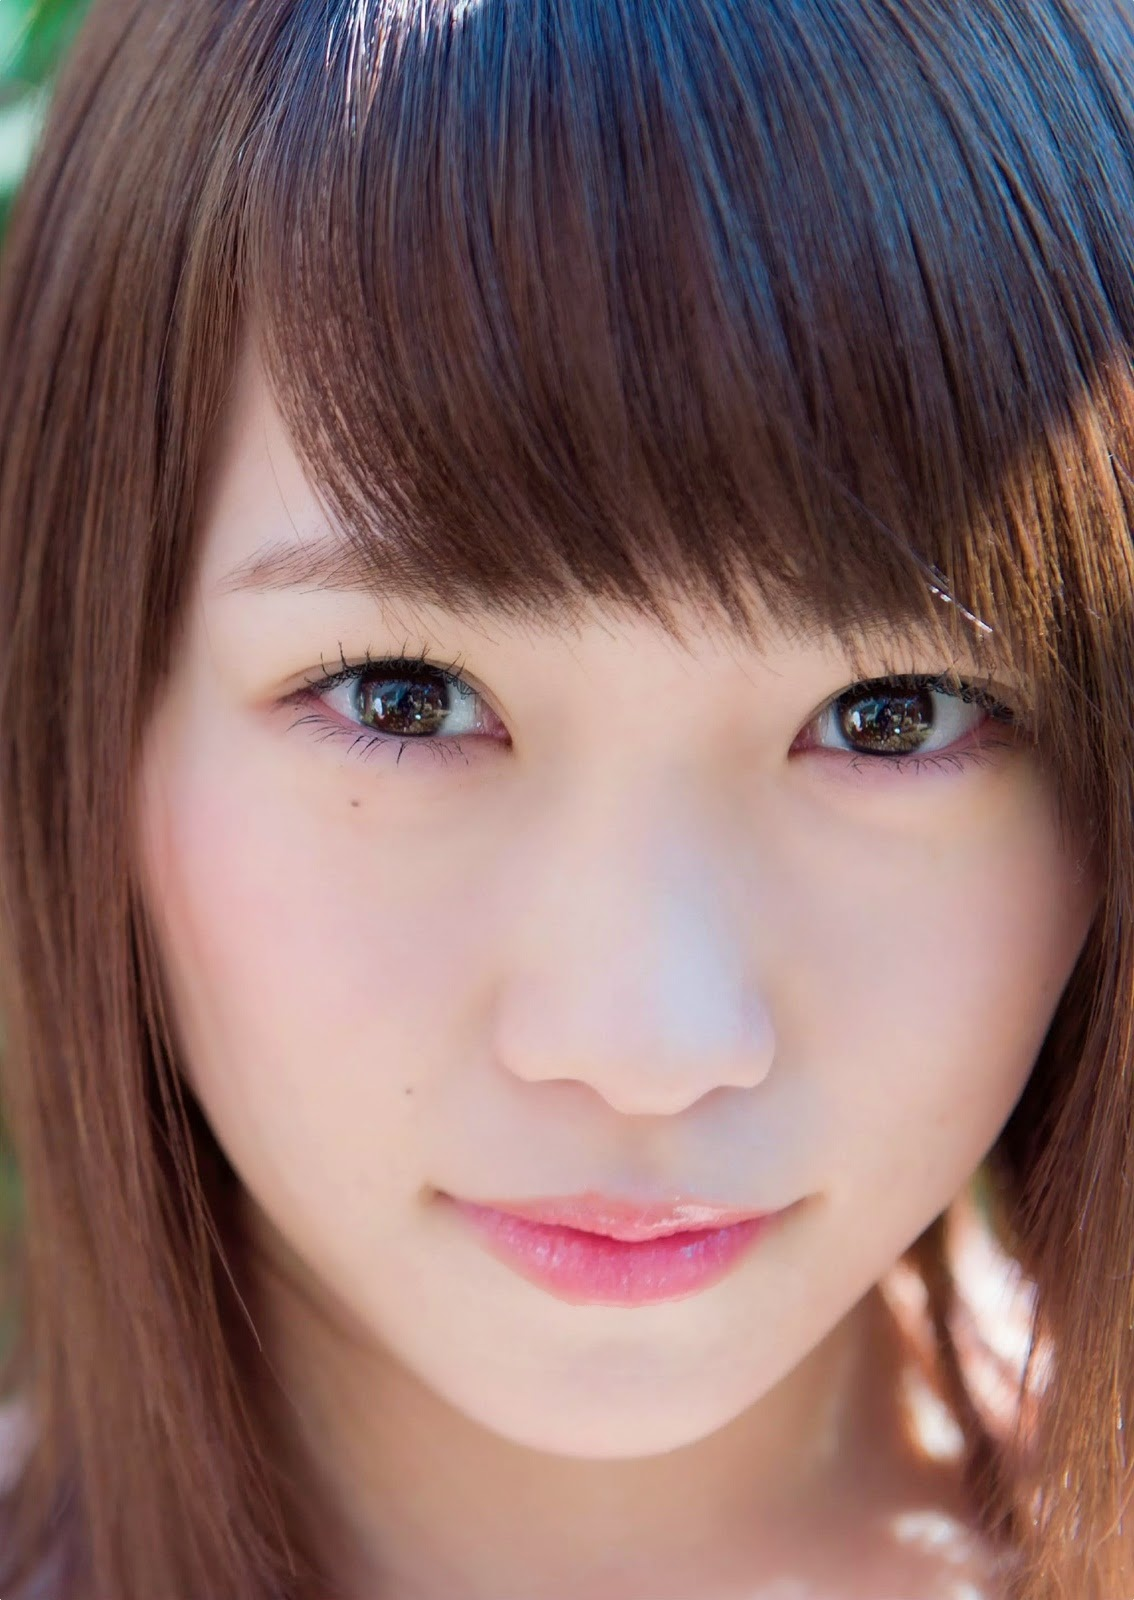 Kawaei Rina 川栄李奈 Graduation Gravure (卒業グラビア) Images 2